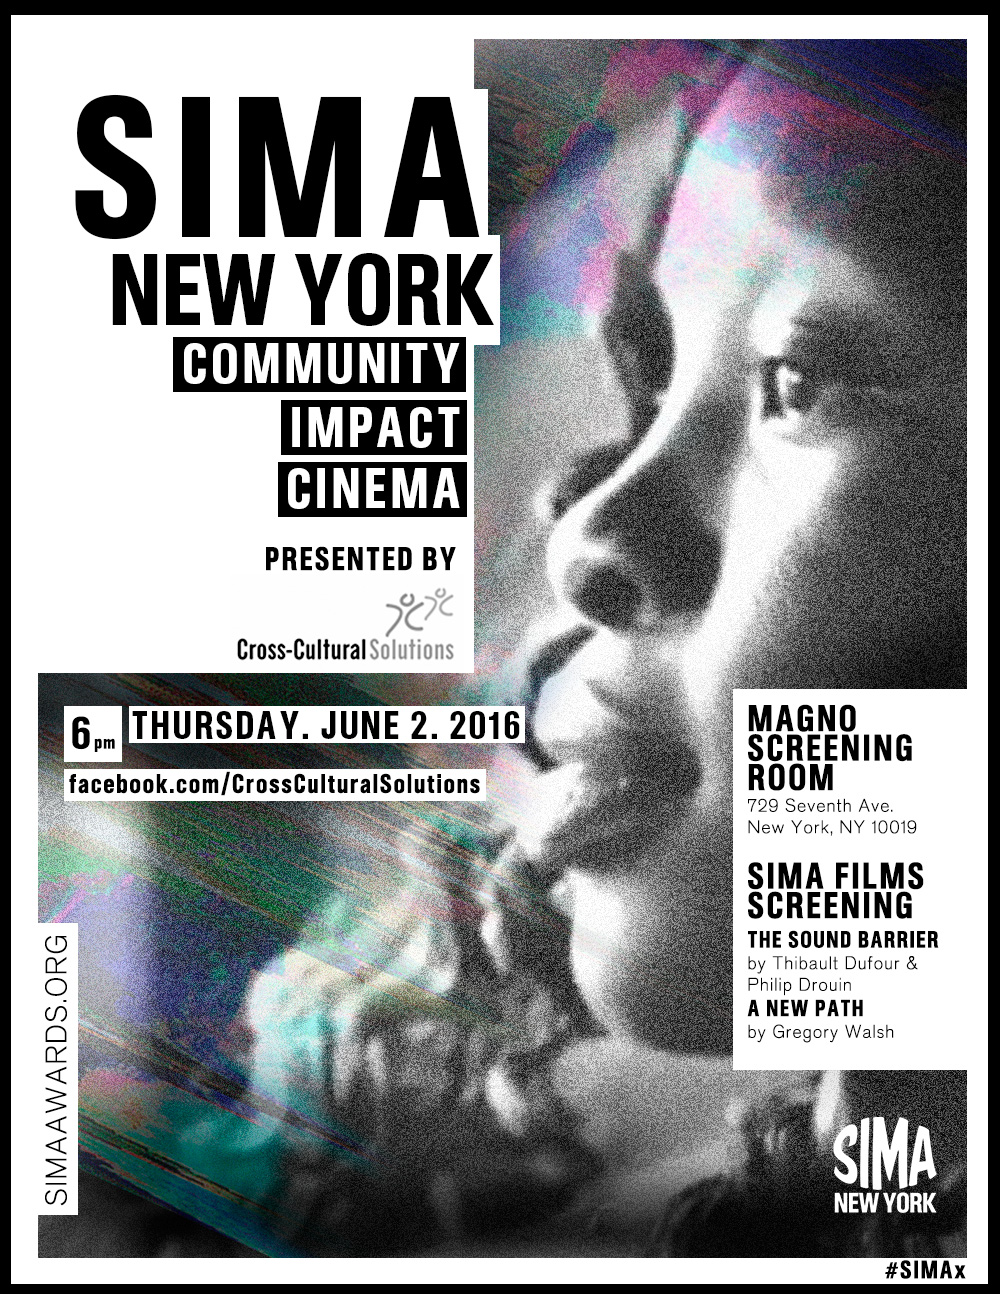 SIMAx-NY.jpg